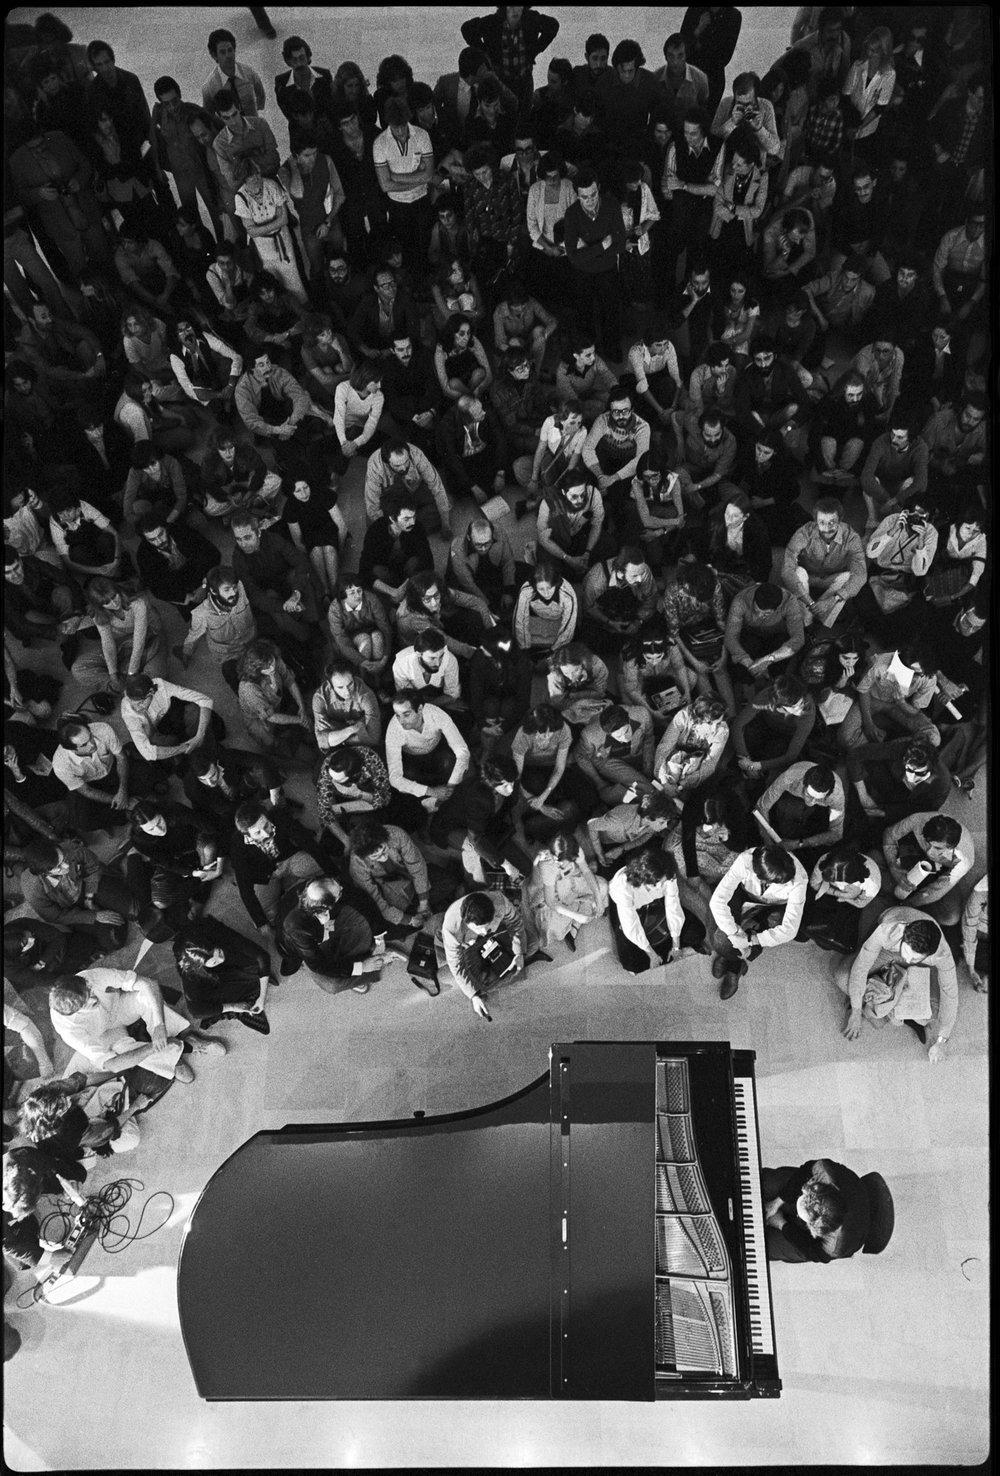 08-Chiari Galleria diArte Moderna  Bologna ©1977 Gianni Melotti.jpg